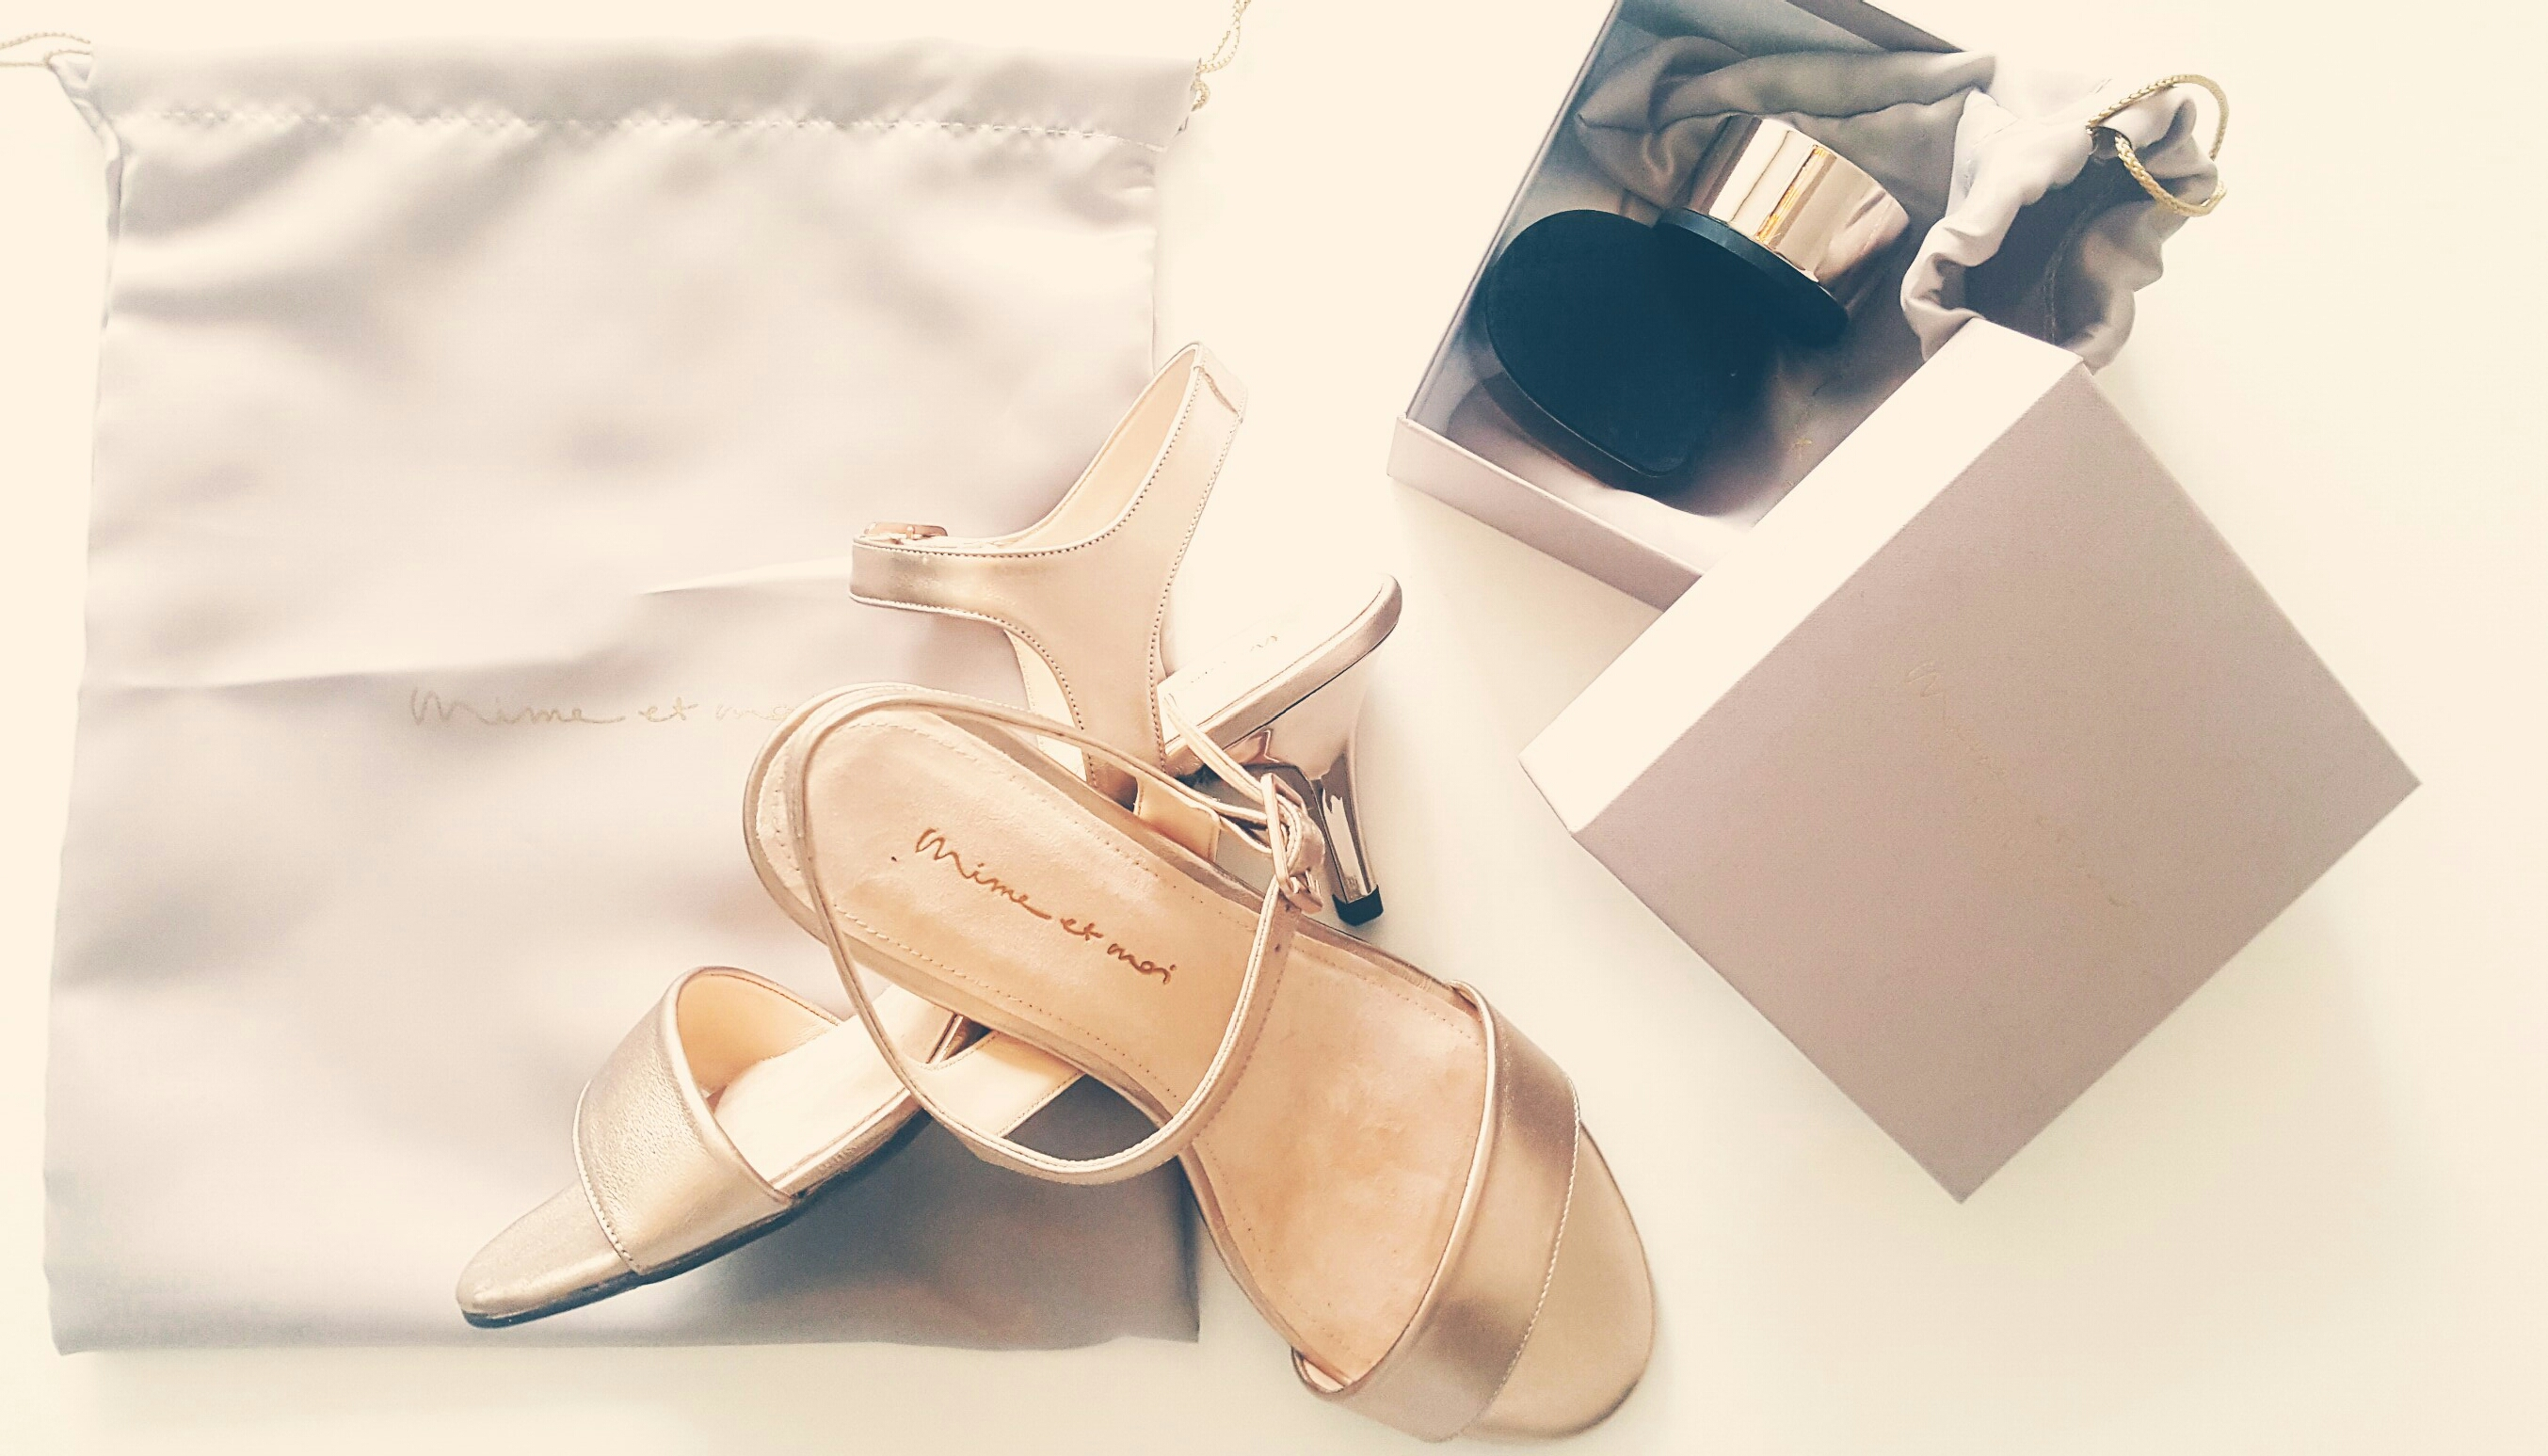 Lieferumfang Schuhe Mime et moi mit dem charakteristischen Wechselabsatz